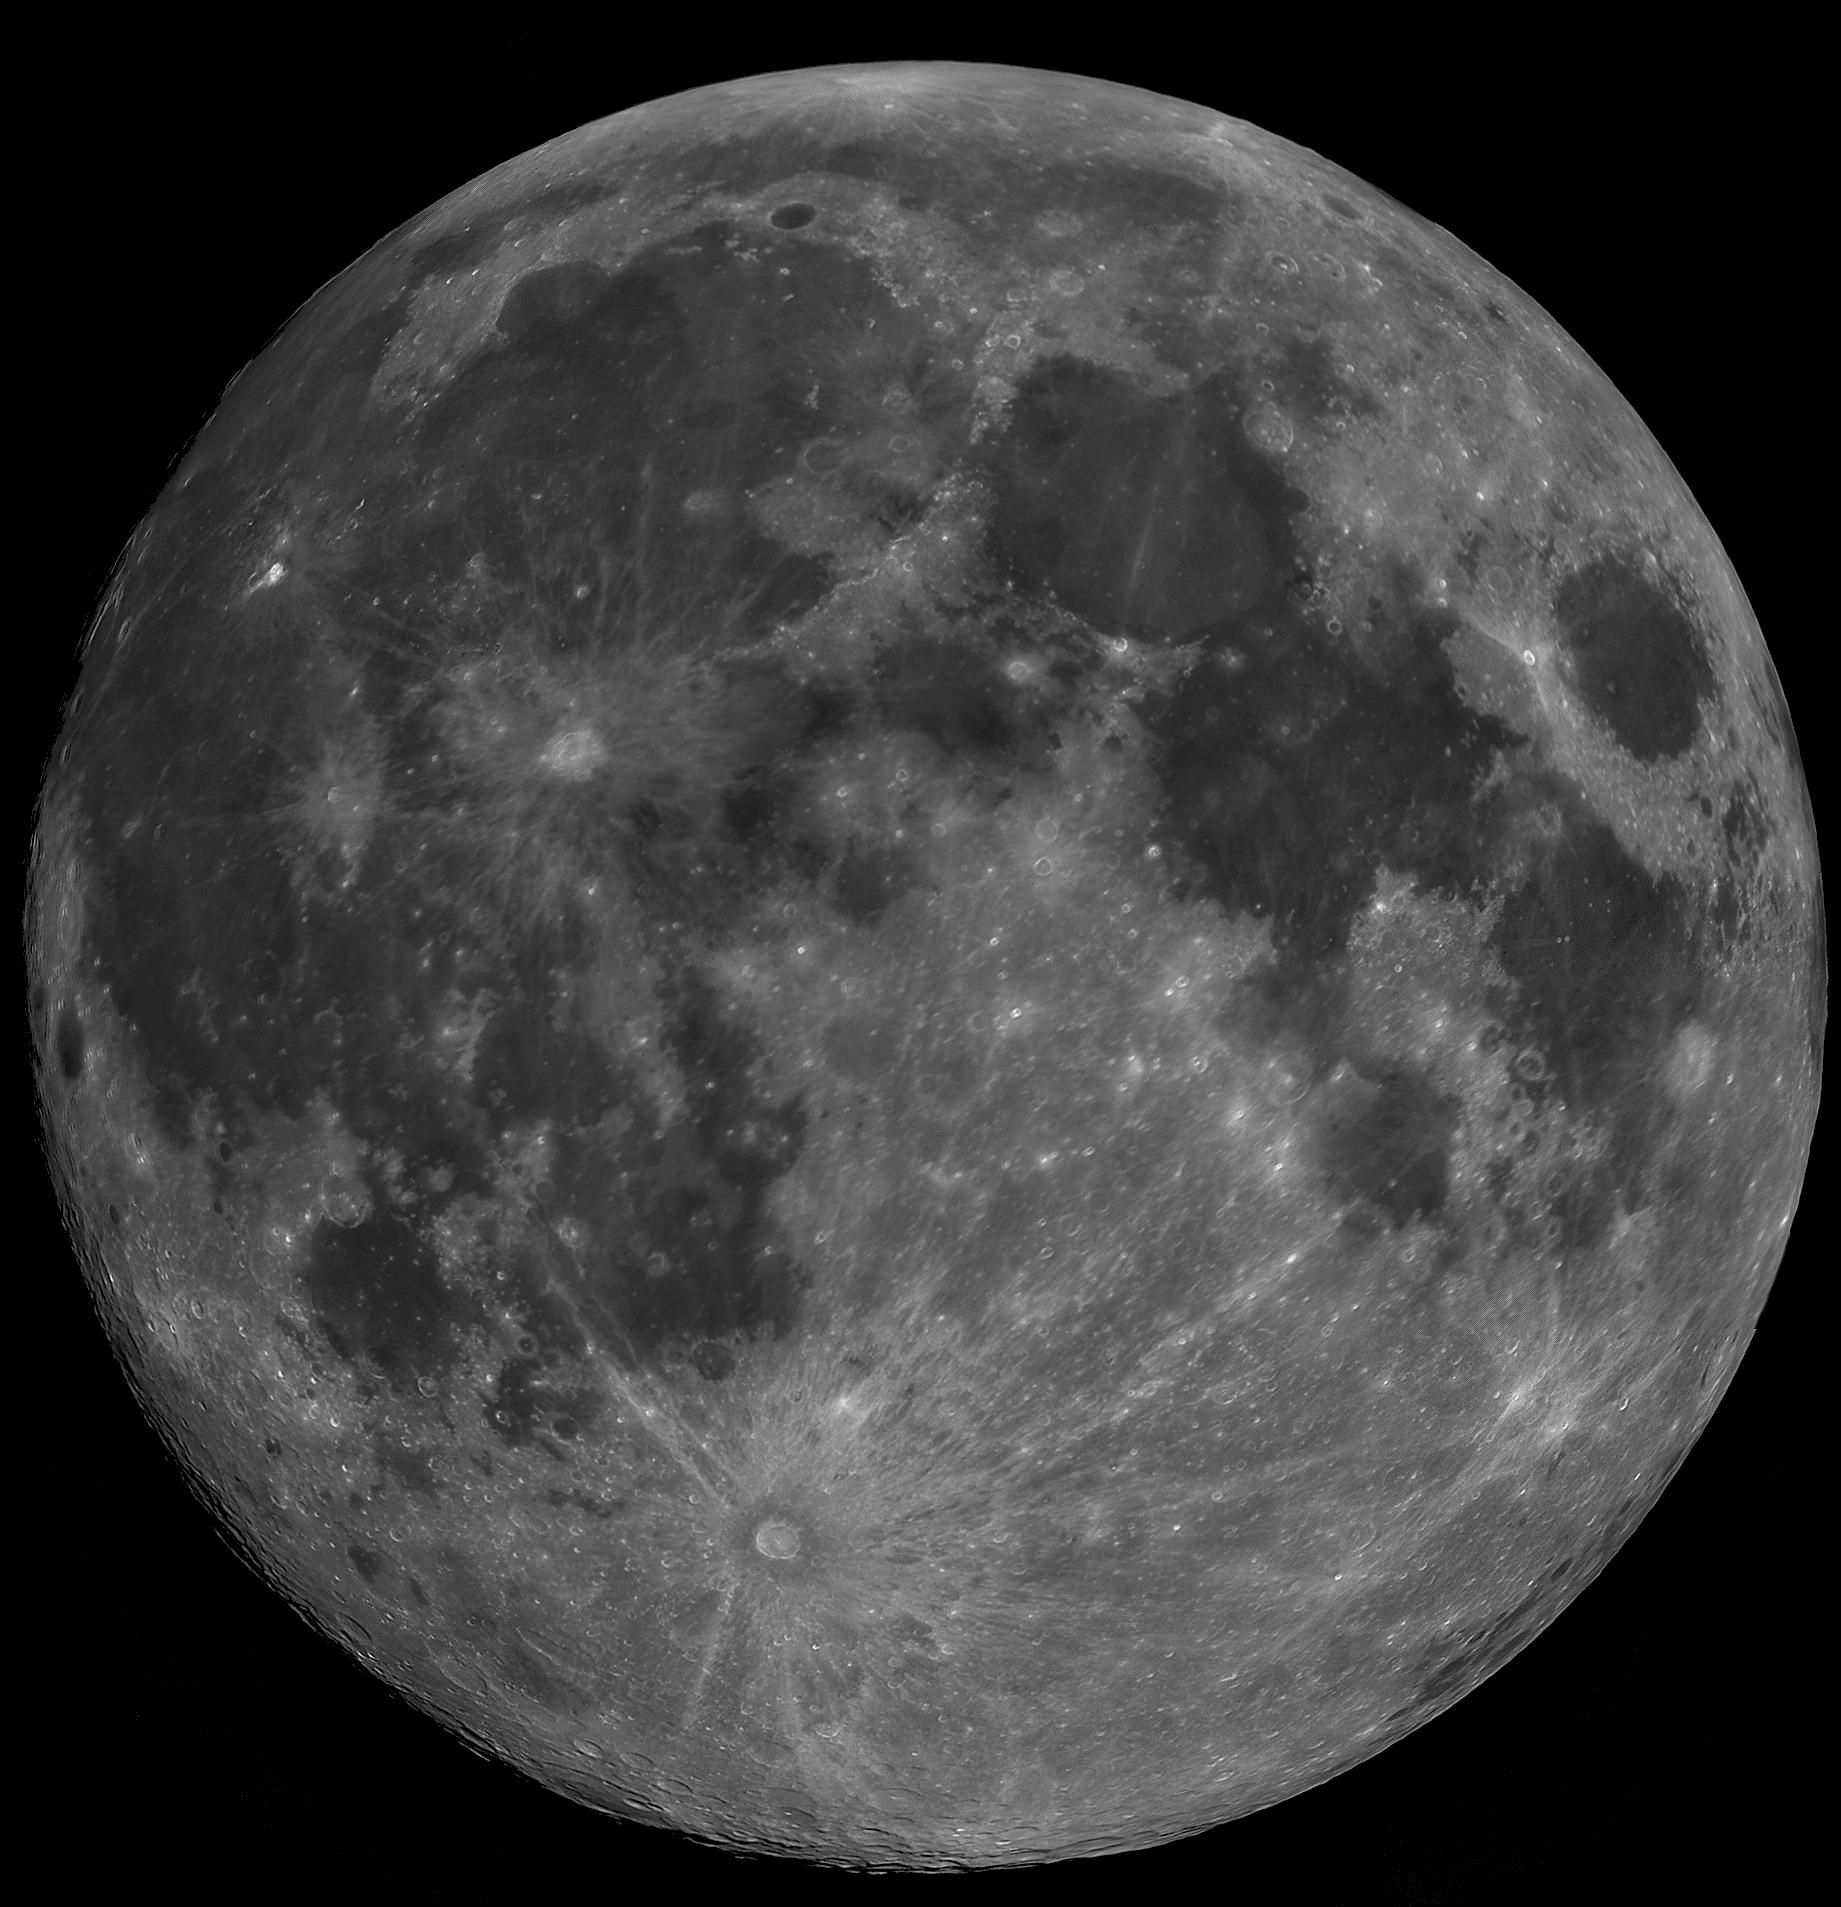 5eb445f0e0663_lune6520.jpg.d7524cf9e5ce19f0a03802f07c7bb741.jpg